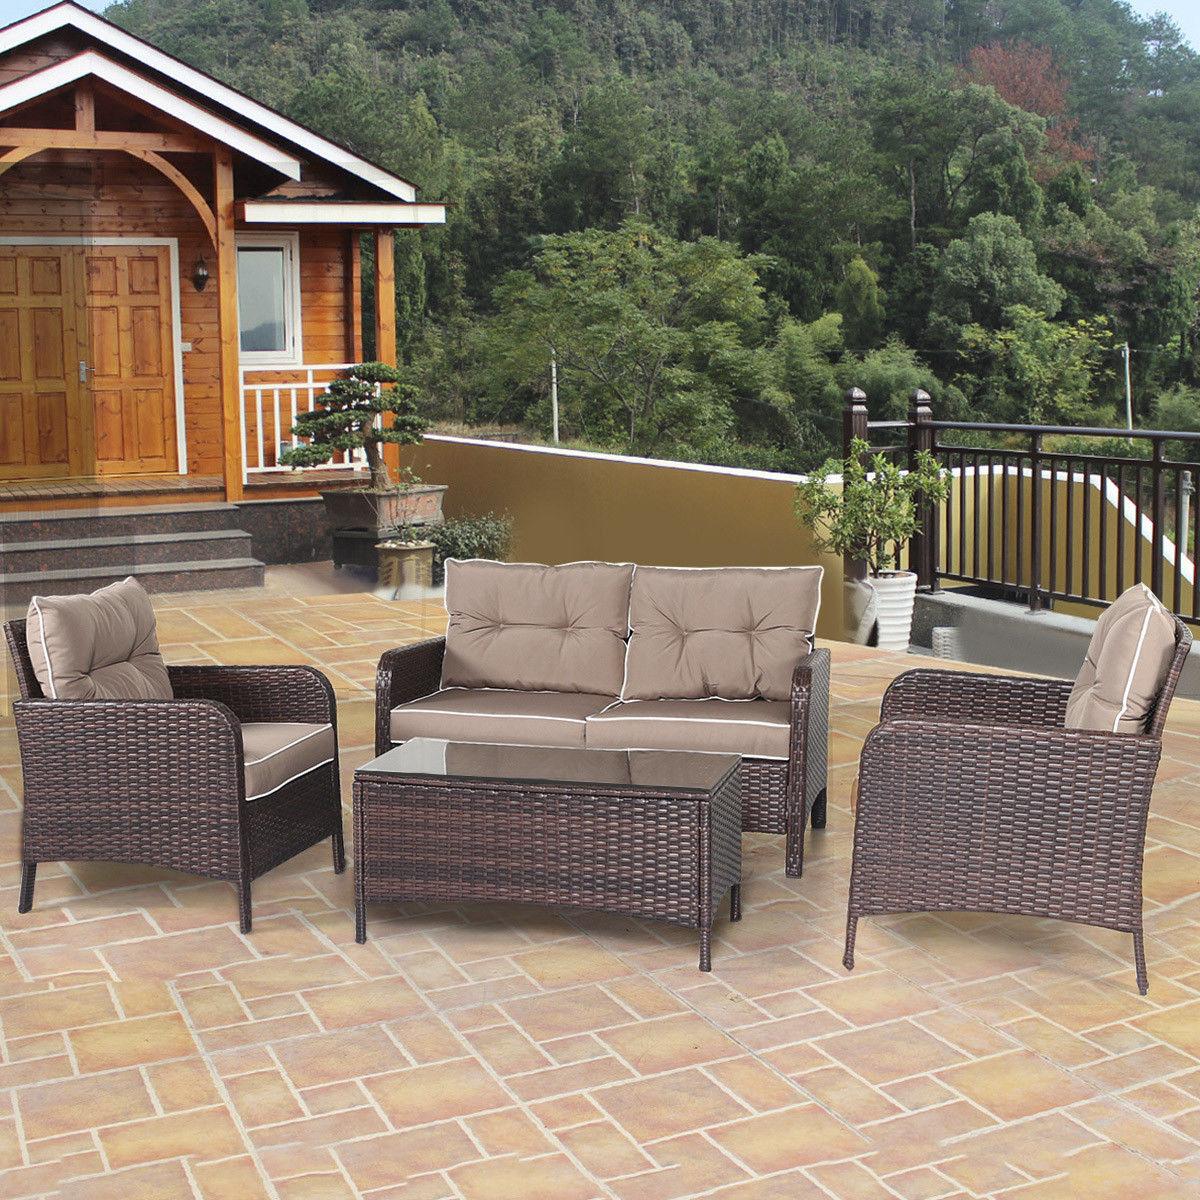 Costway 4 PCS Outdoor Patio Rattan Wicker Furniture Set Sofa Loveseat W/ Cushions